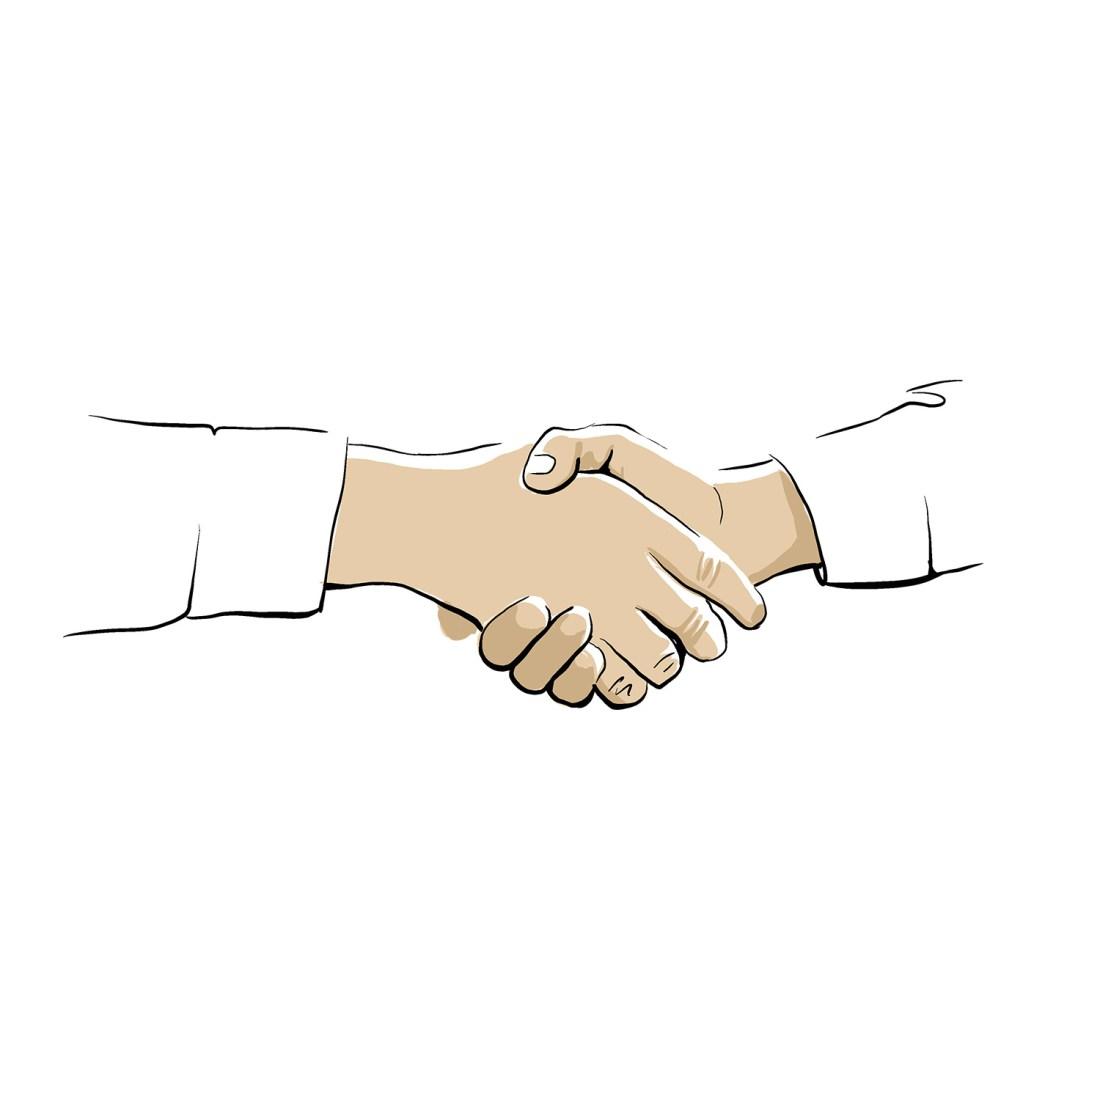 Hände Referenzen Partnerschaft commma